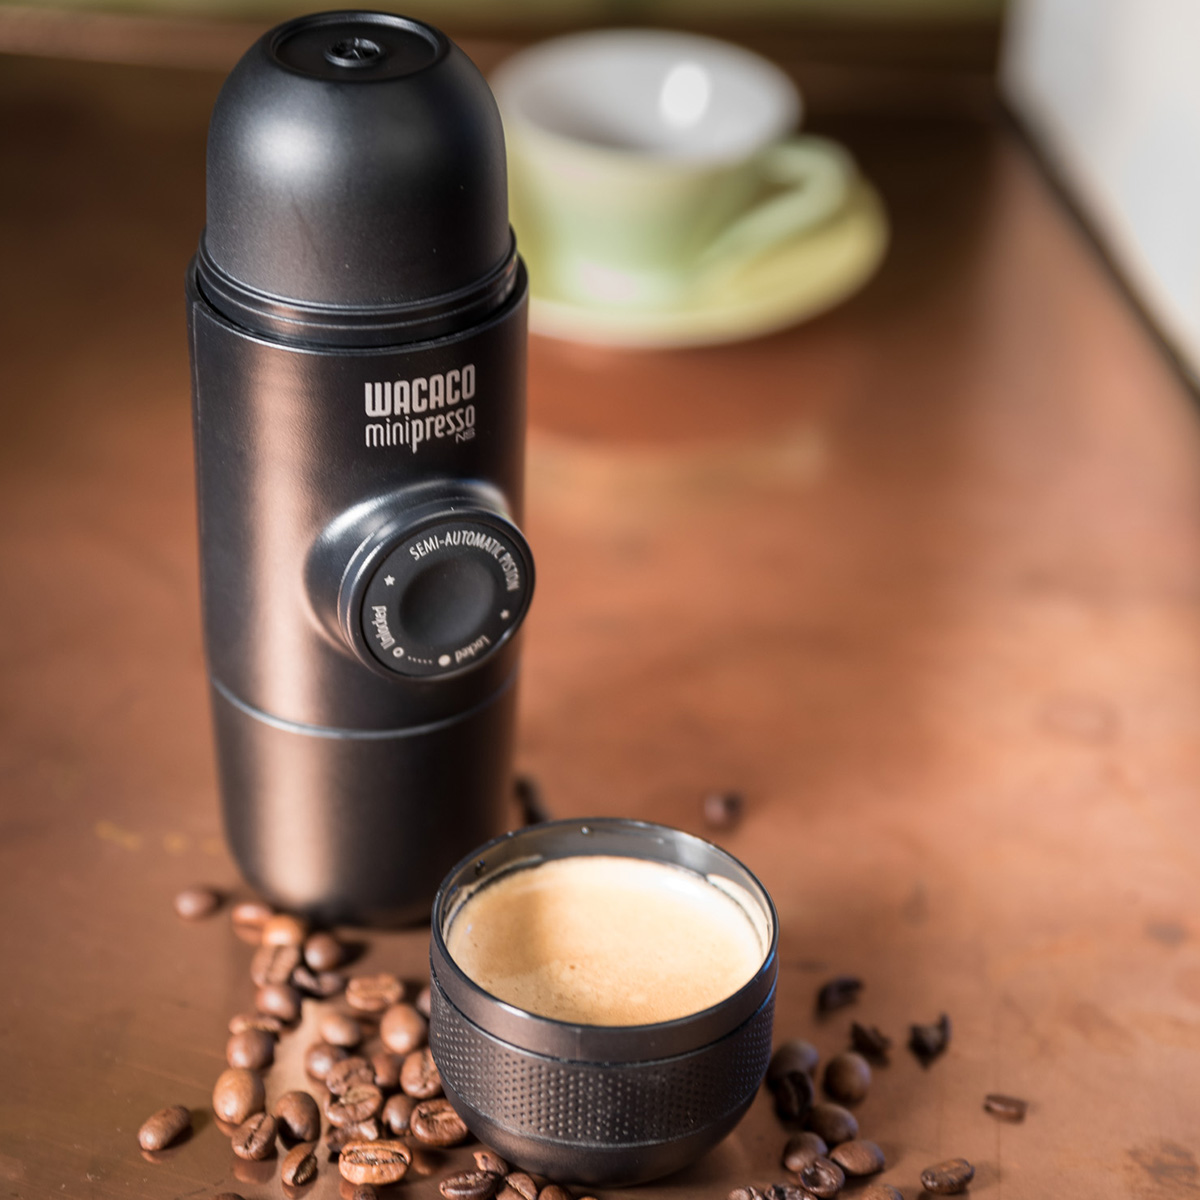 WacacominipressoMinipresso - meest compacte espressomachine ter wereld - Capsules(NS )